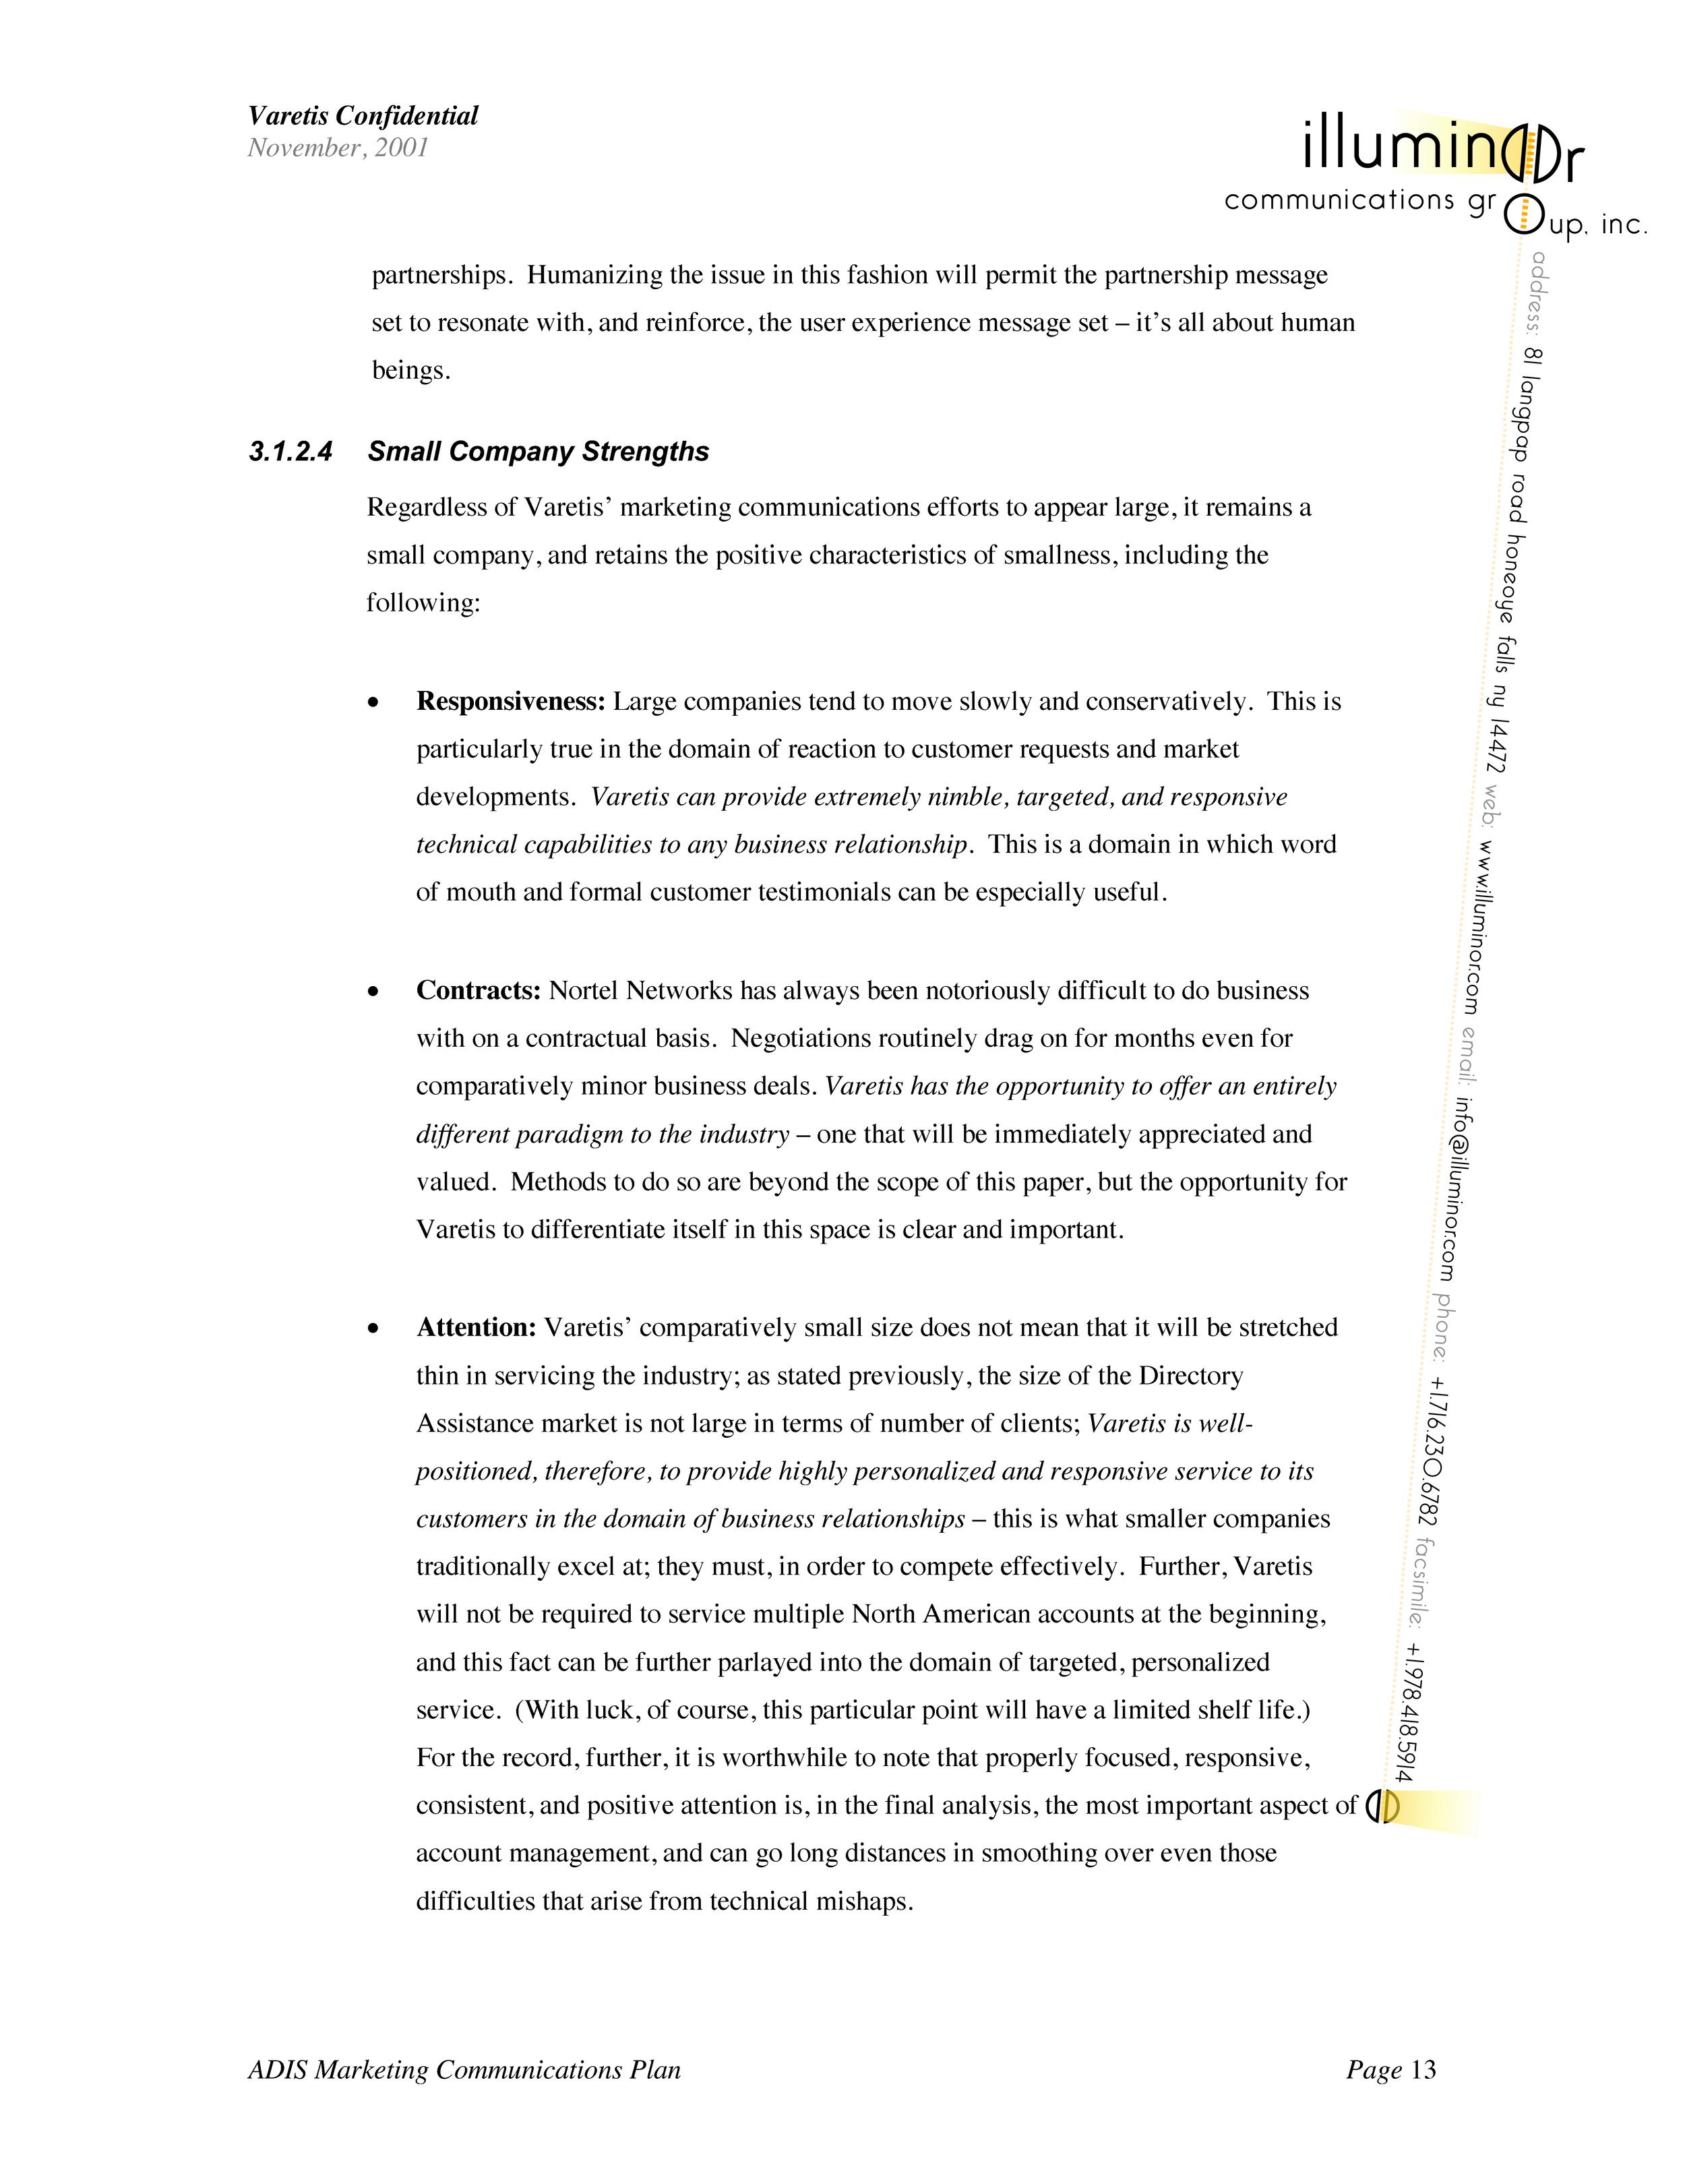 ADIS Marcomm Plan_Page_13.png